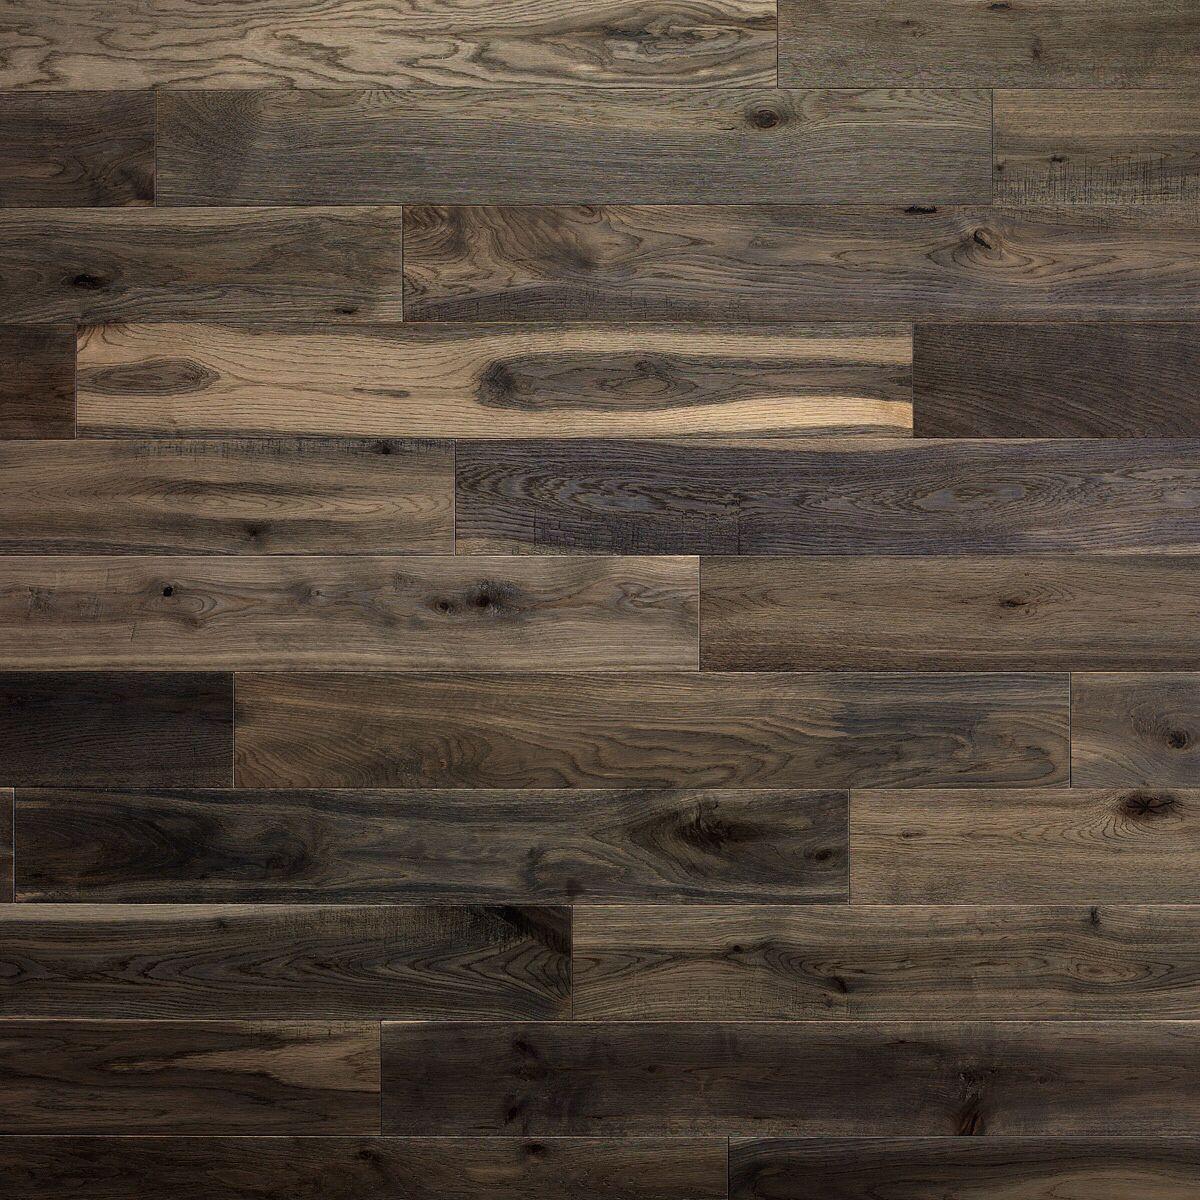 Iron Springs Engineered Oak Hardwood Flooring